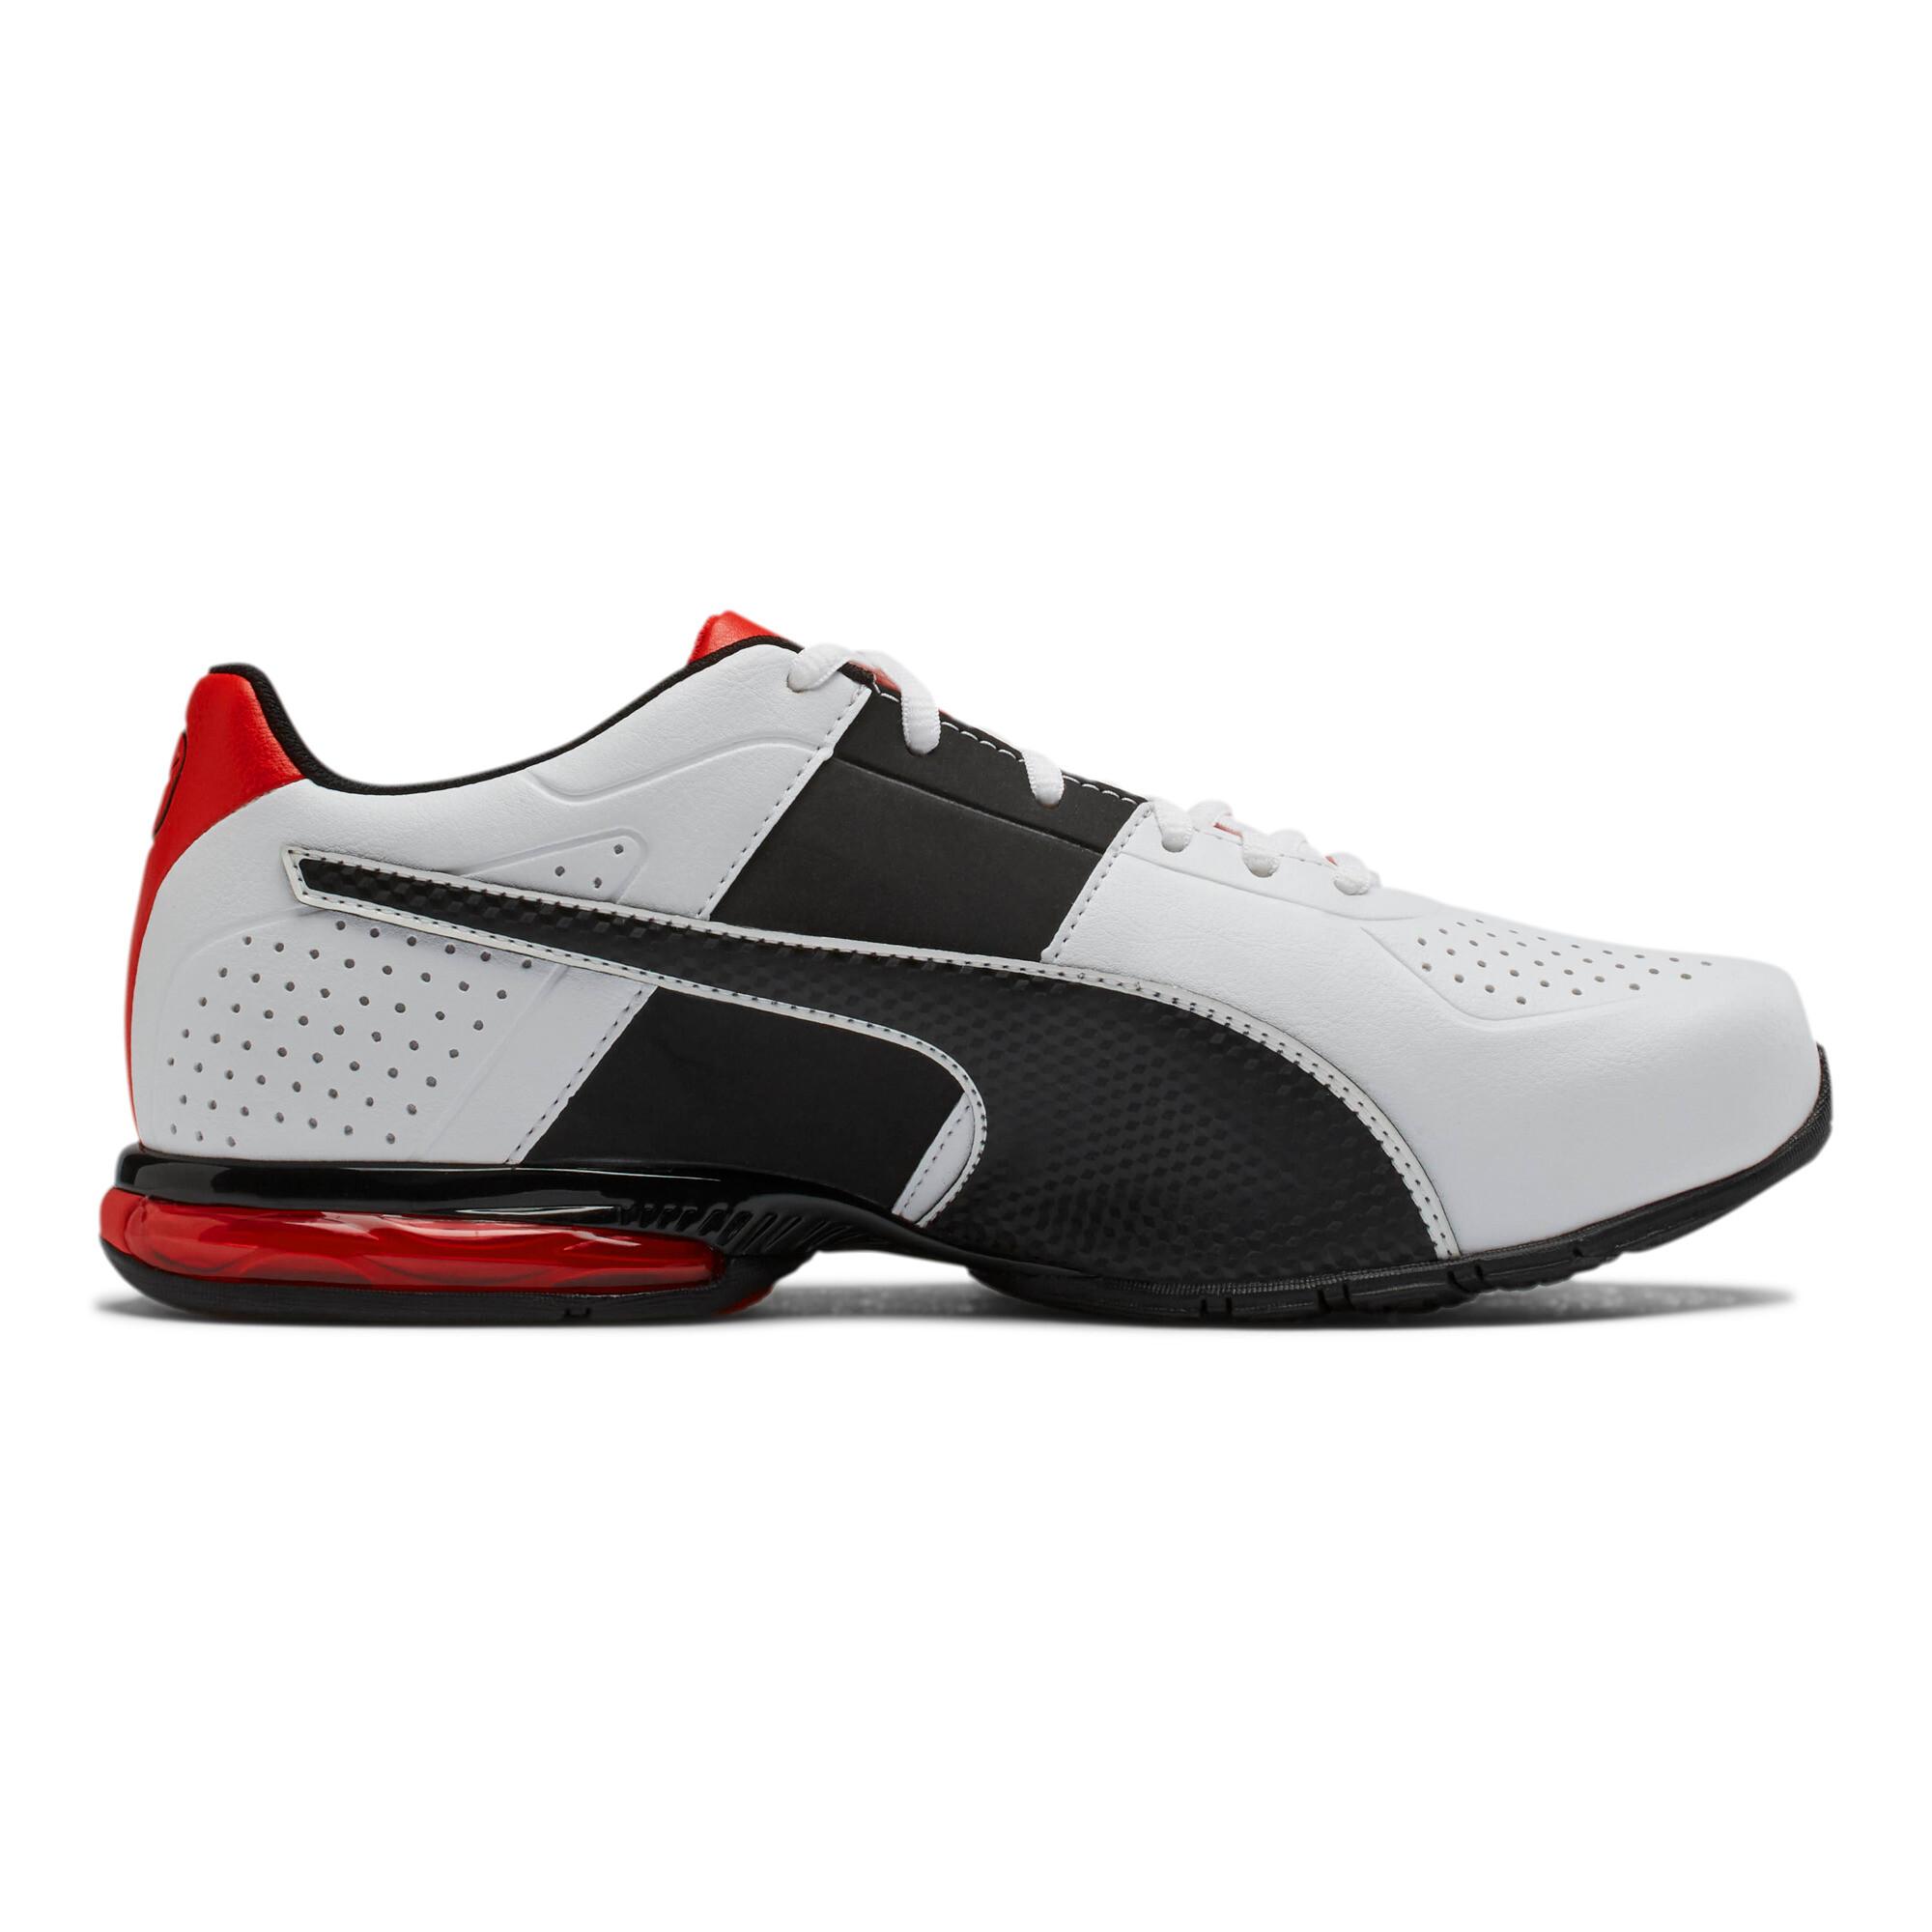 PUMA-Cell-Surin-2-Wide-Men-s-Training-Shoes-Men-Shoe-Running thumbnail 6